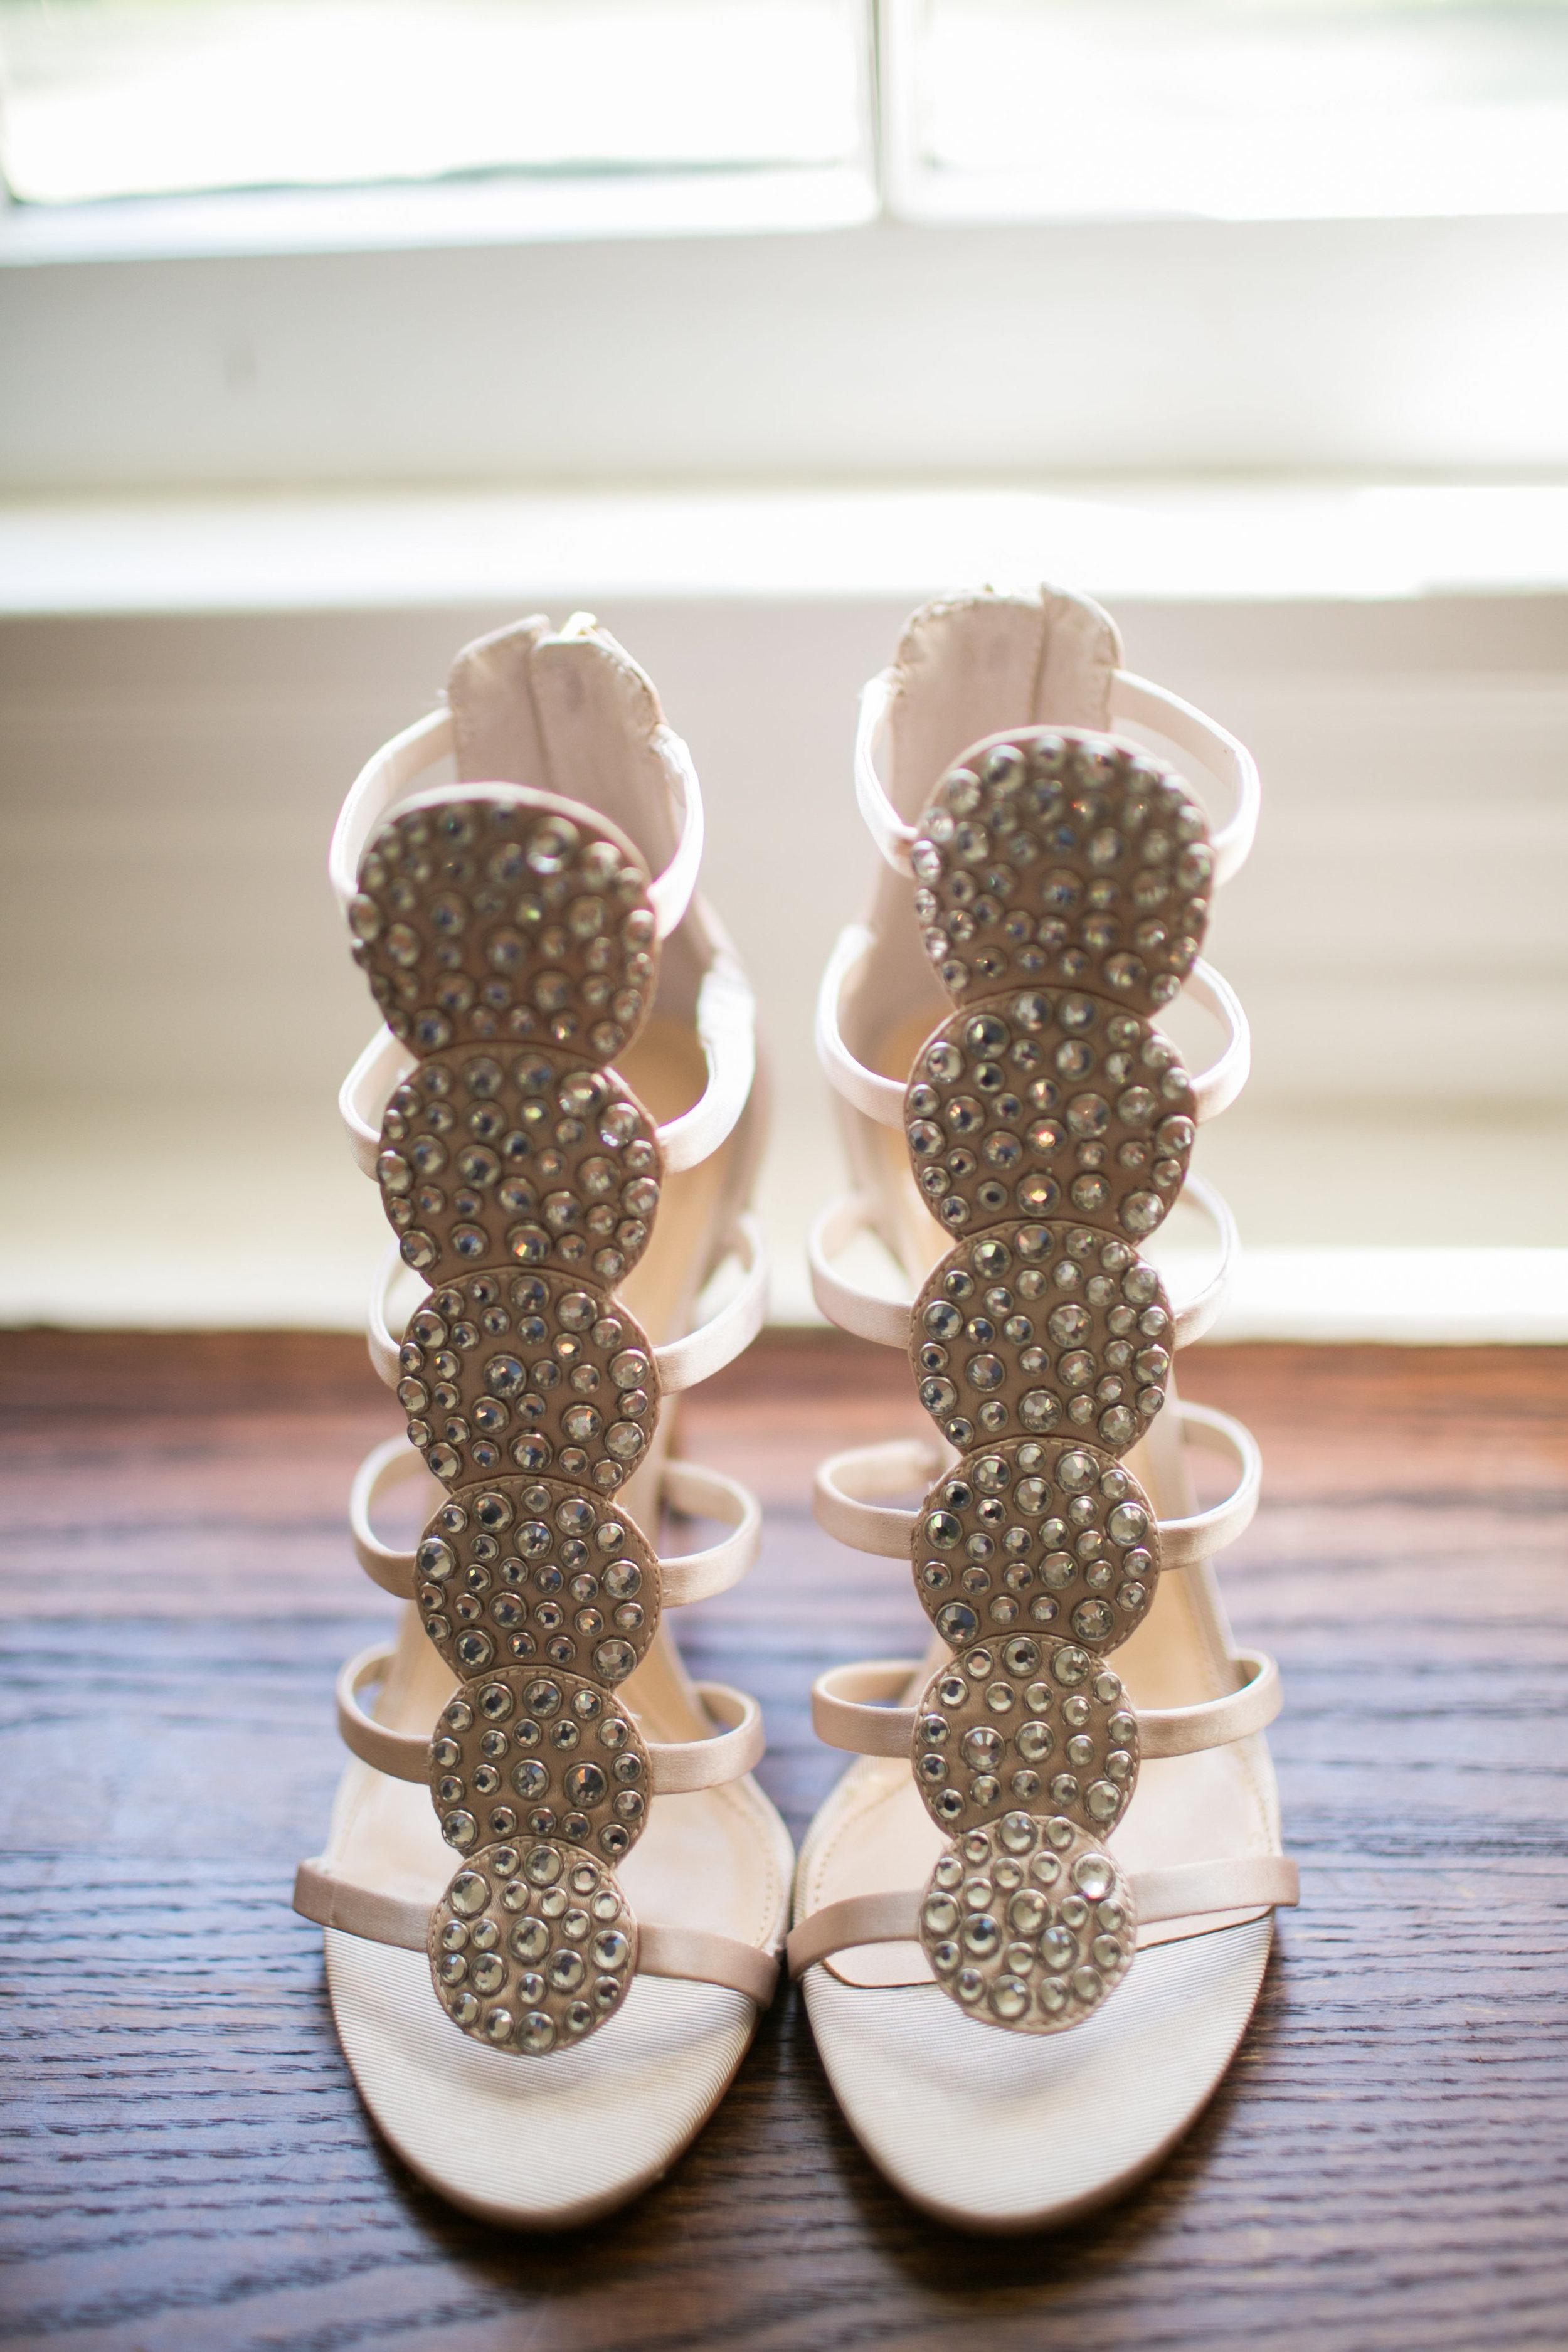 Pure elegance events Tynise Kee dc wedding planner va wedding planner rust manor house leesburg -0003.jpg